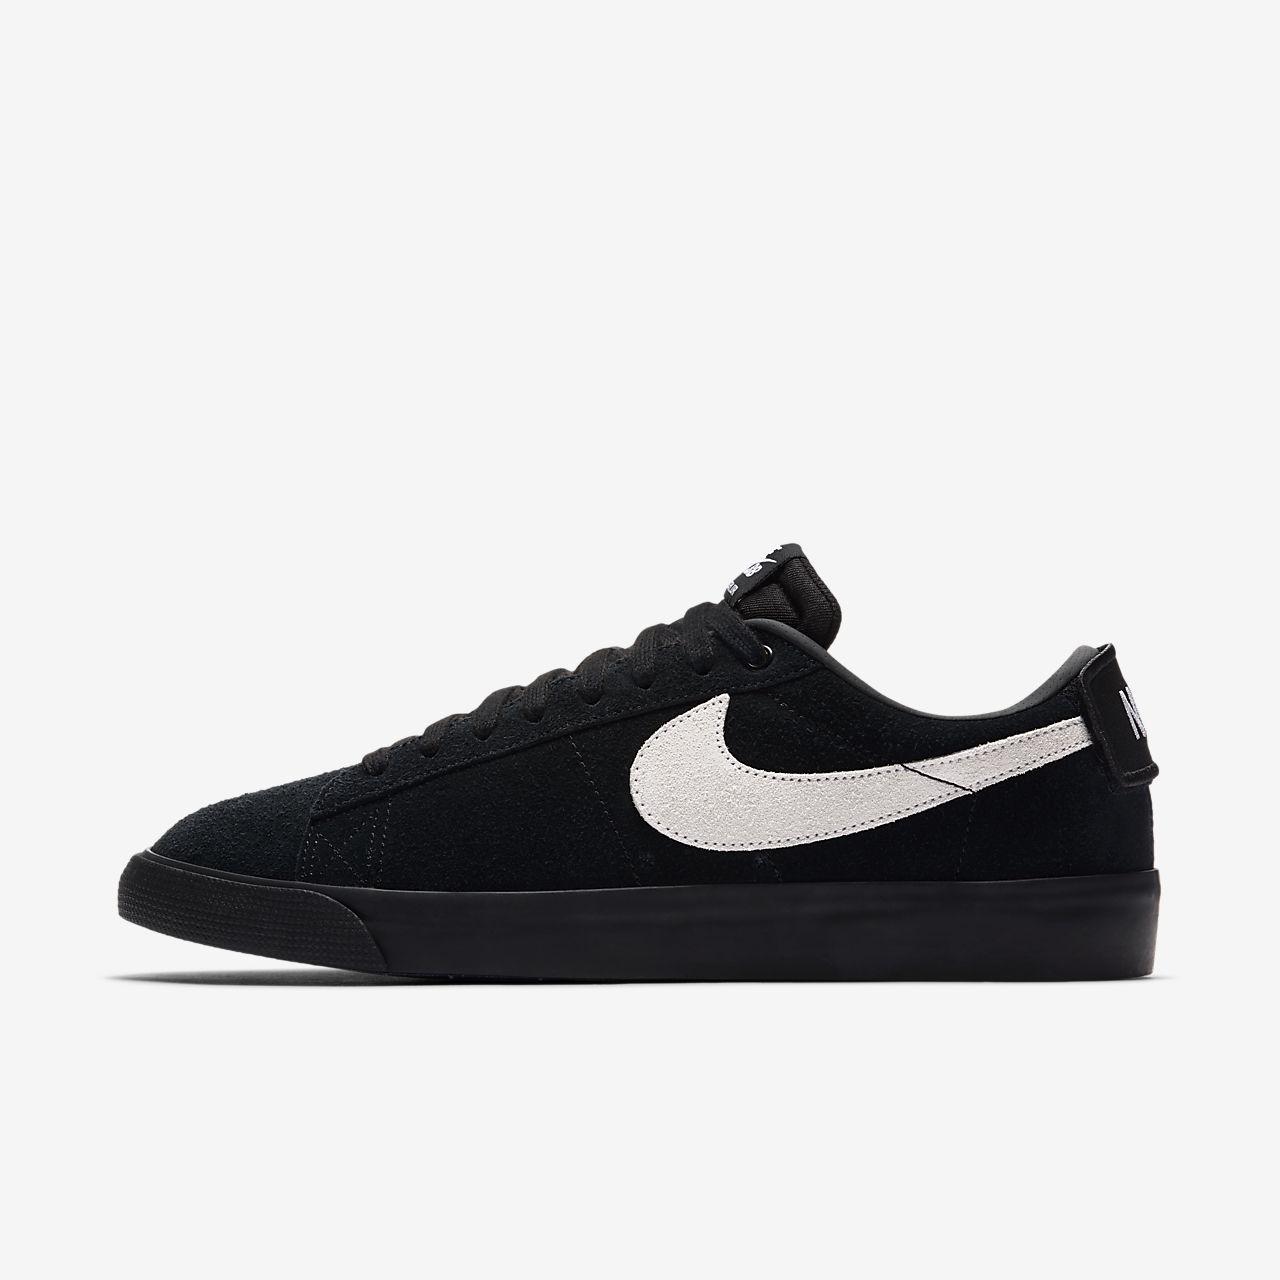 Nike Sb Blazer Baja Gt Comprar Y Vender